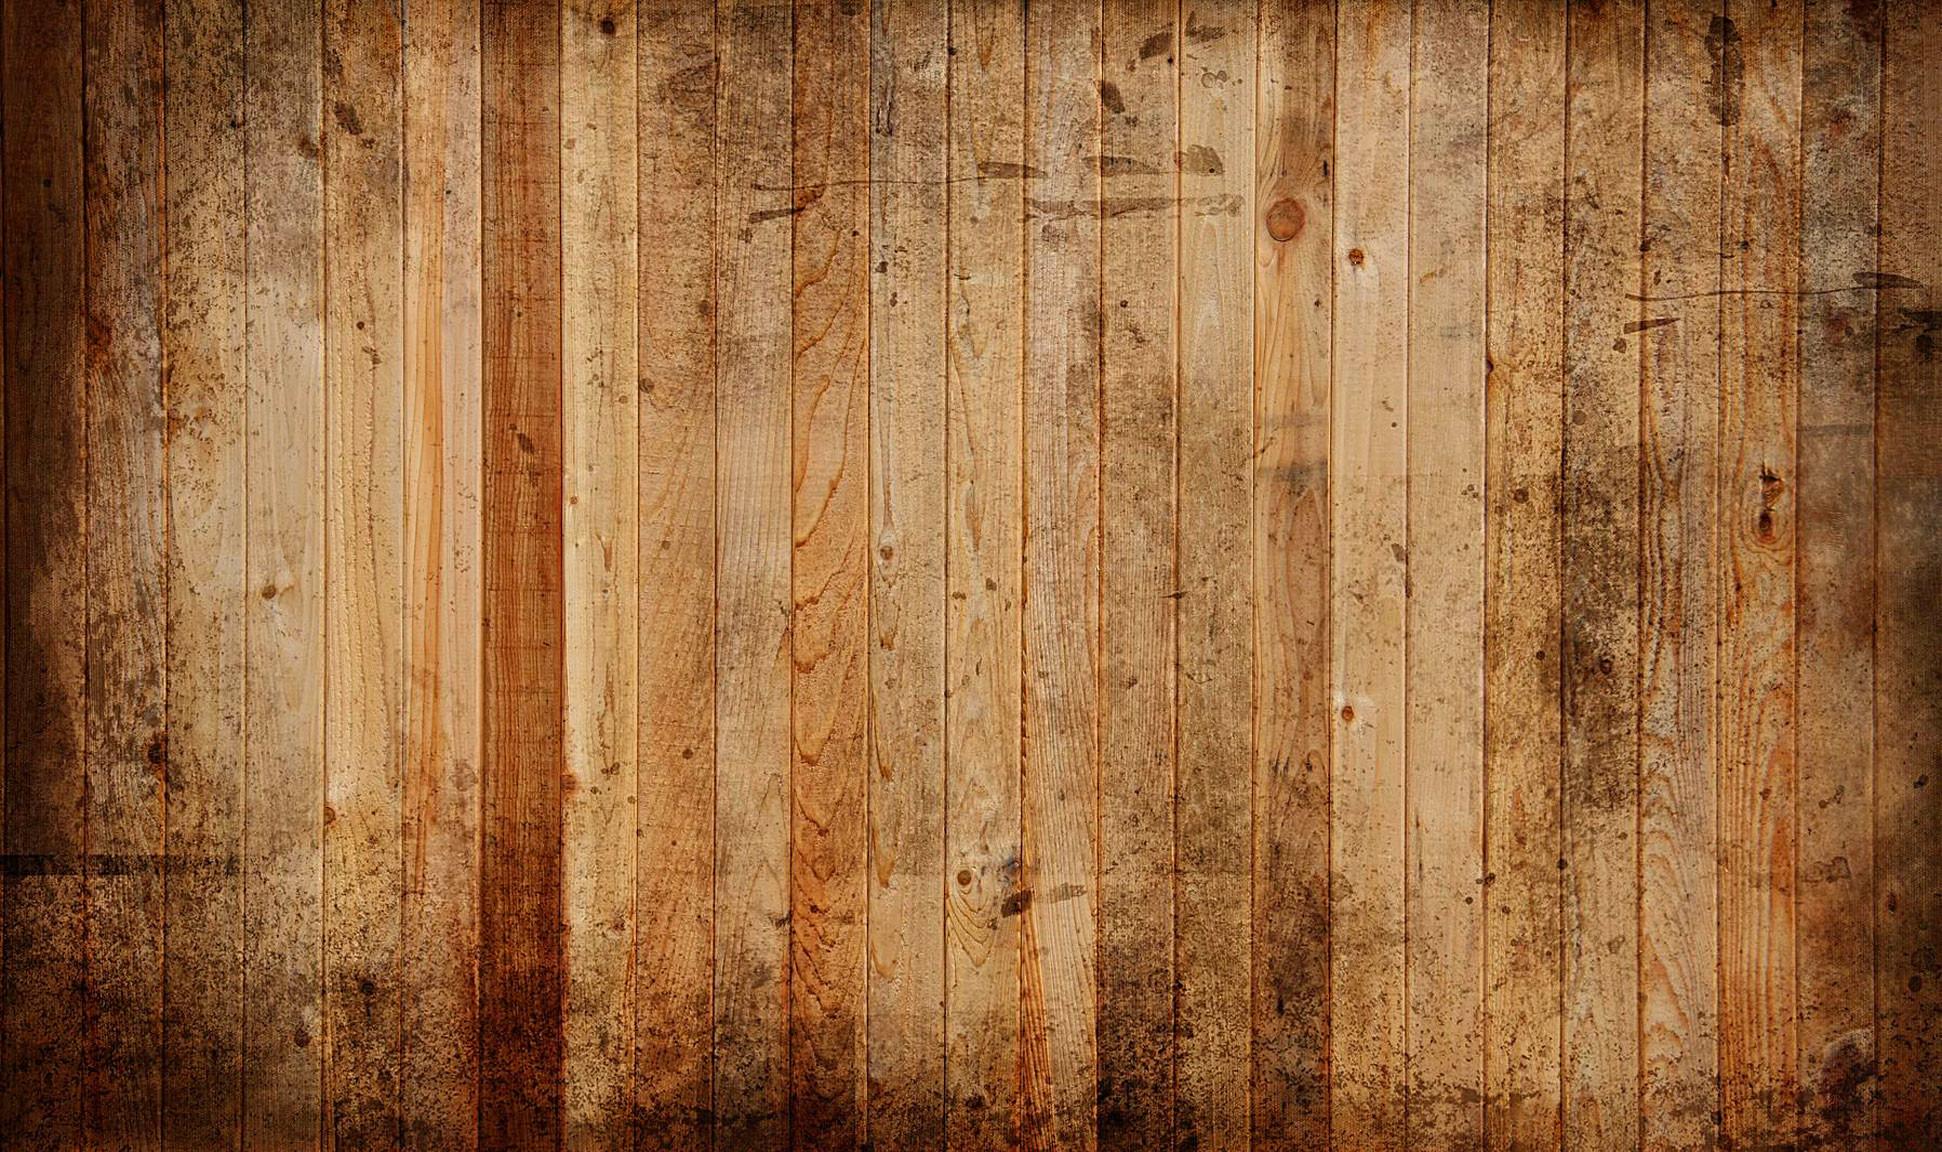 Vintage Rustic Wood Background – furnituretexture.club